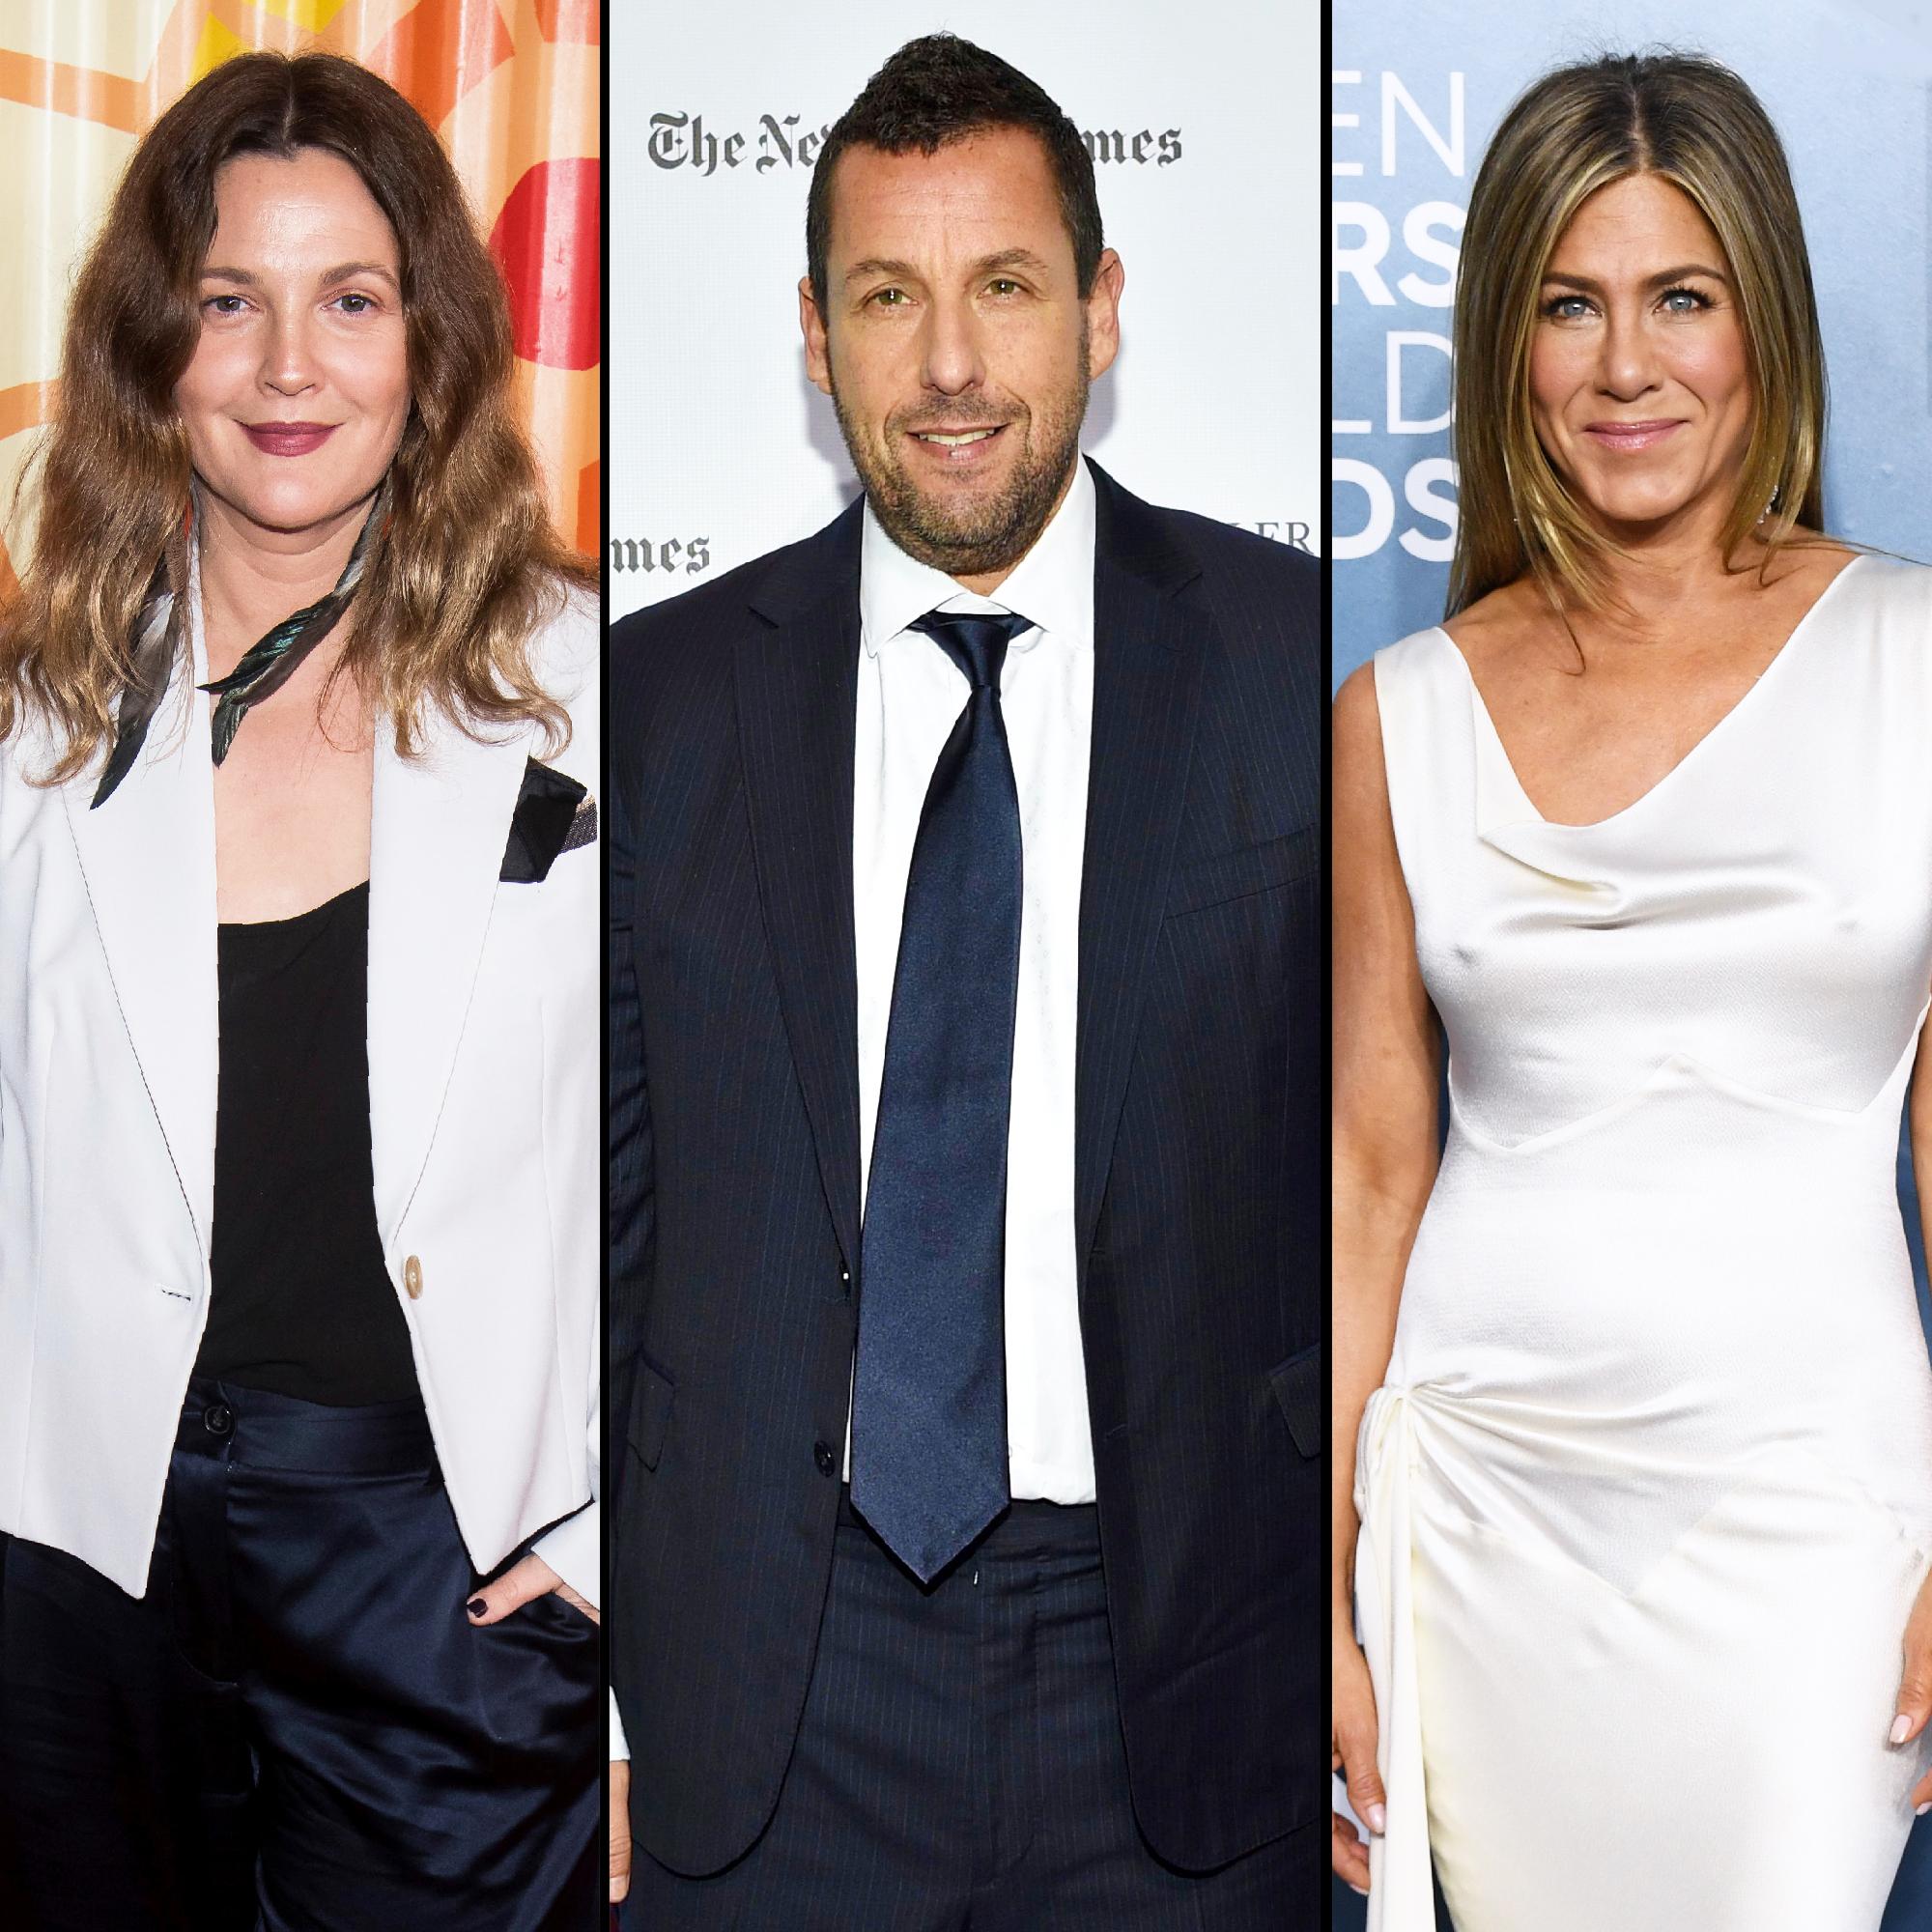 Drew Barrymore Trends After Adam Sandler Jennifer Aniston Diss